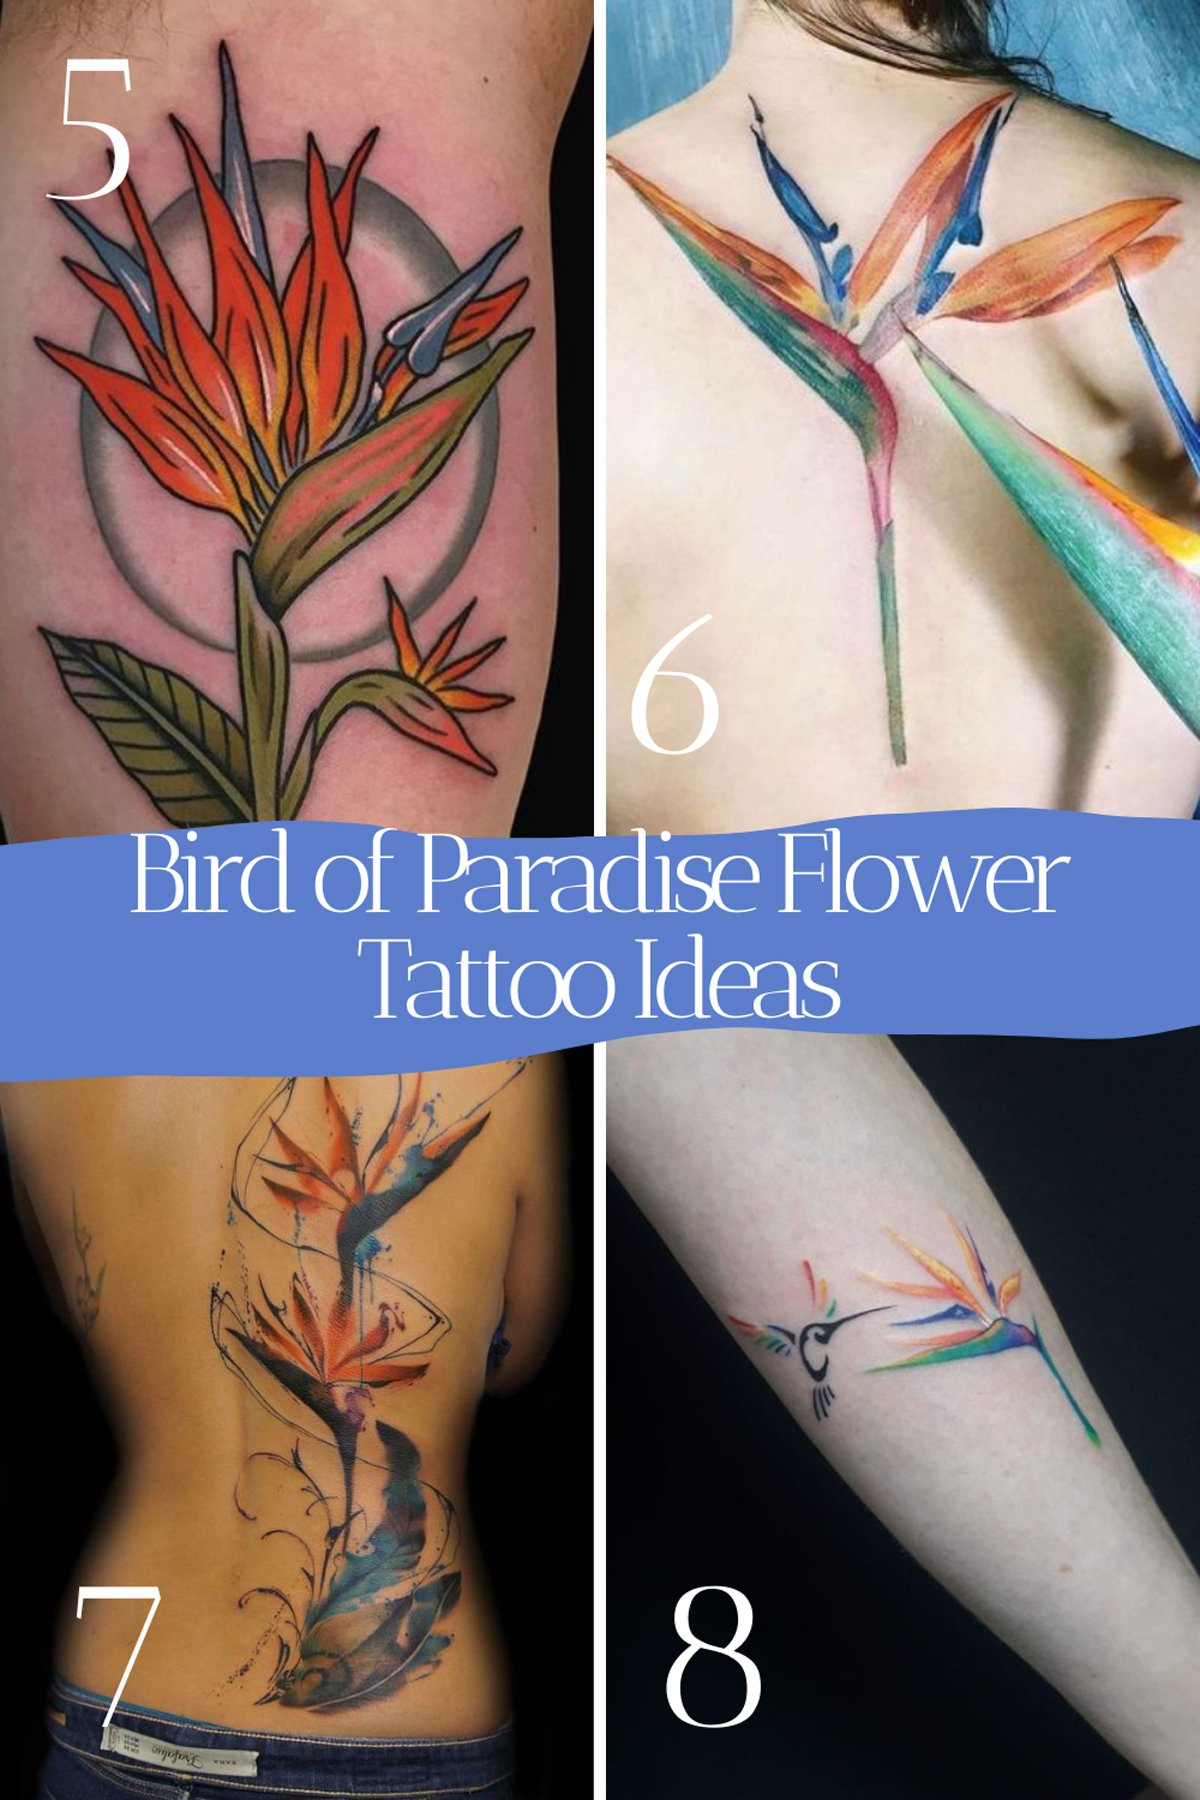 Bird of Paradise Flower Ink Designs